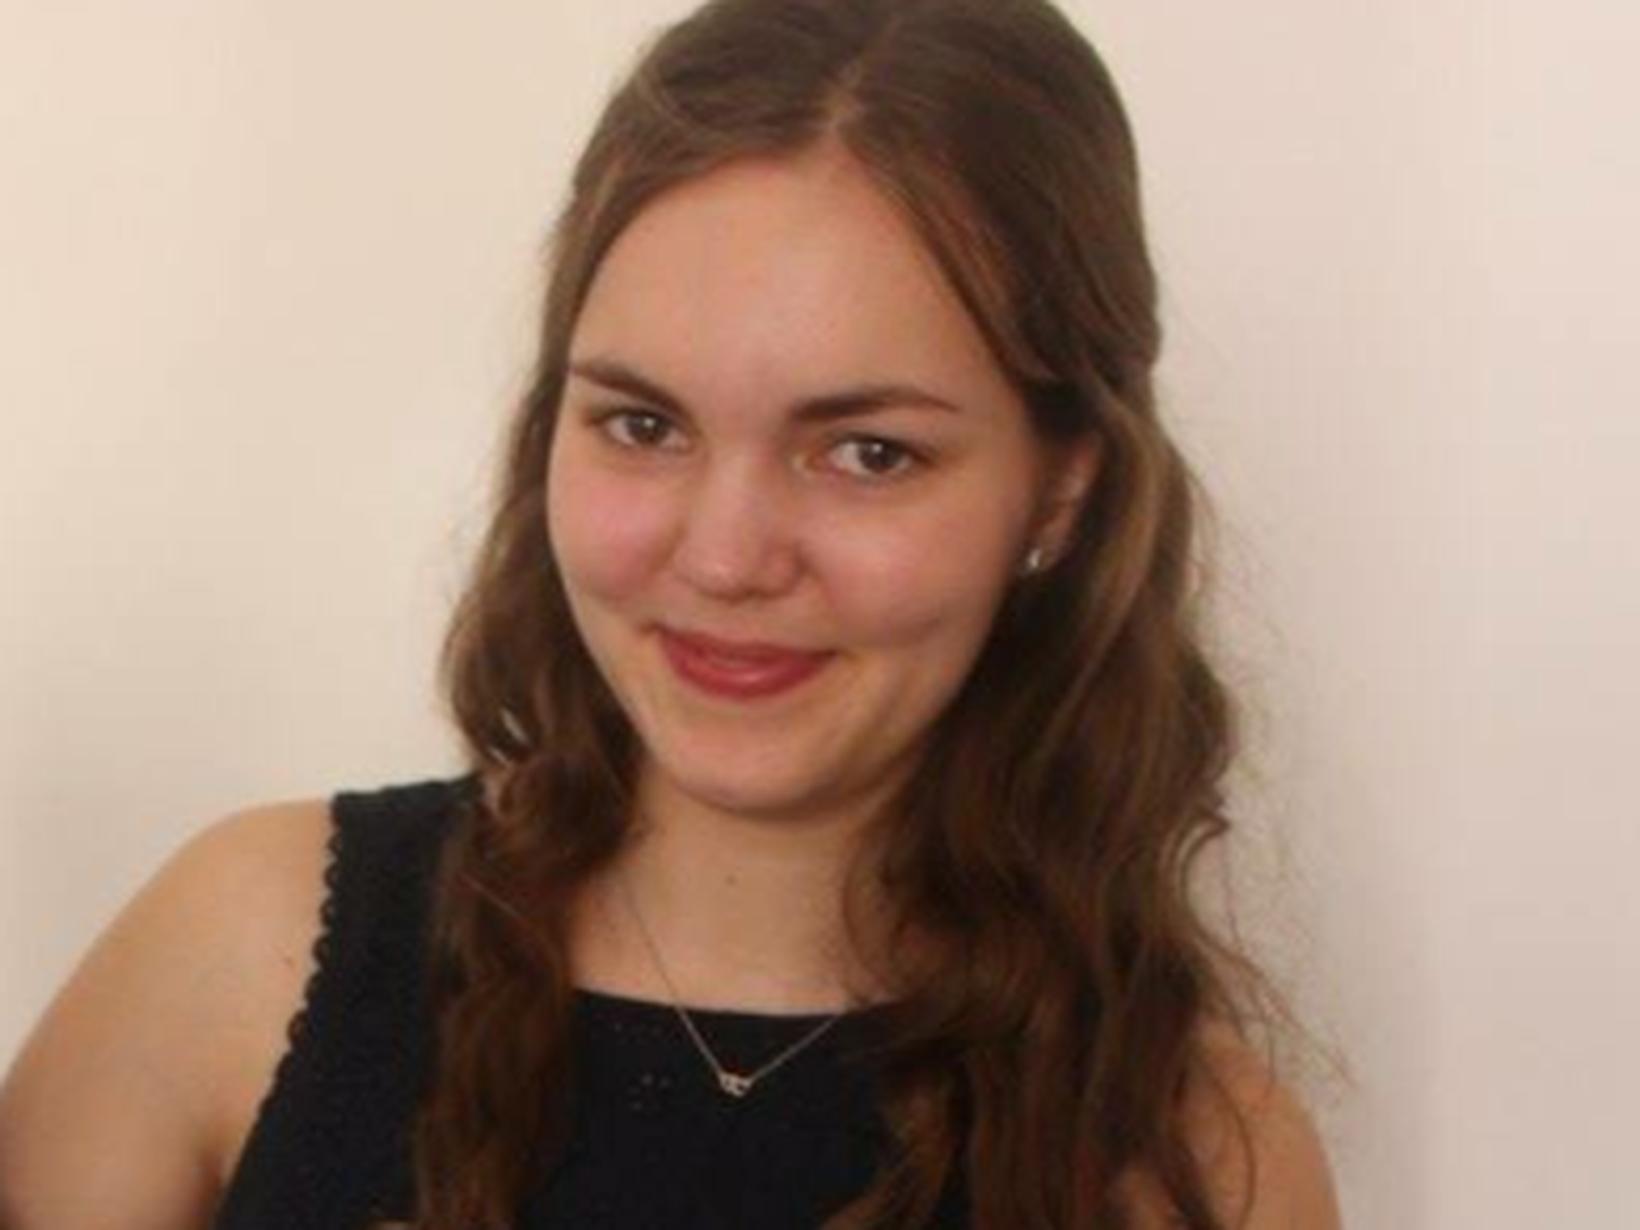 Jacqueline from Kiel, Germany